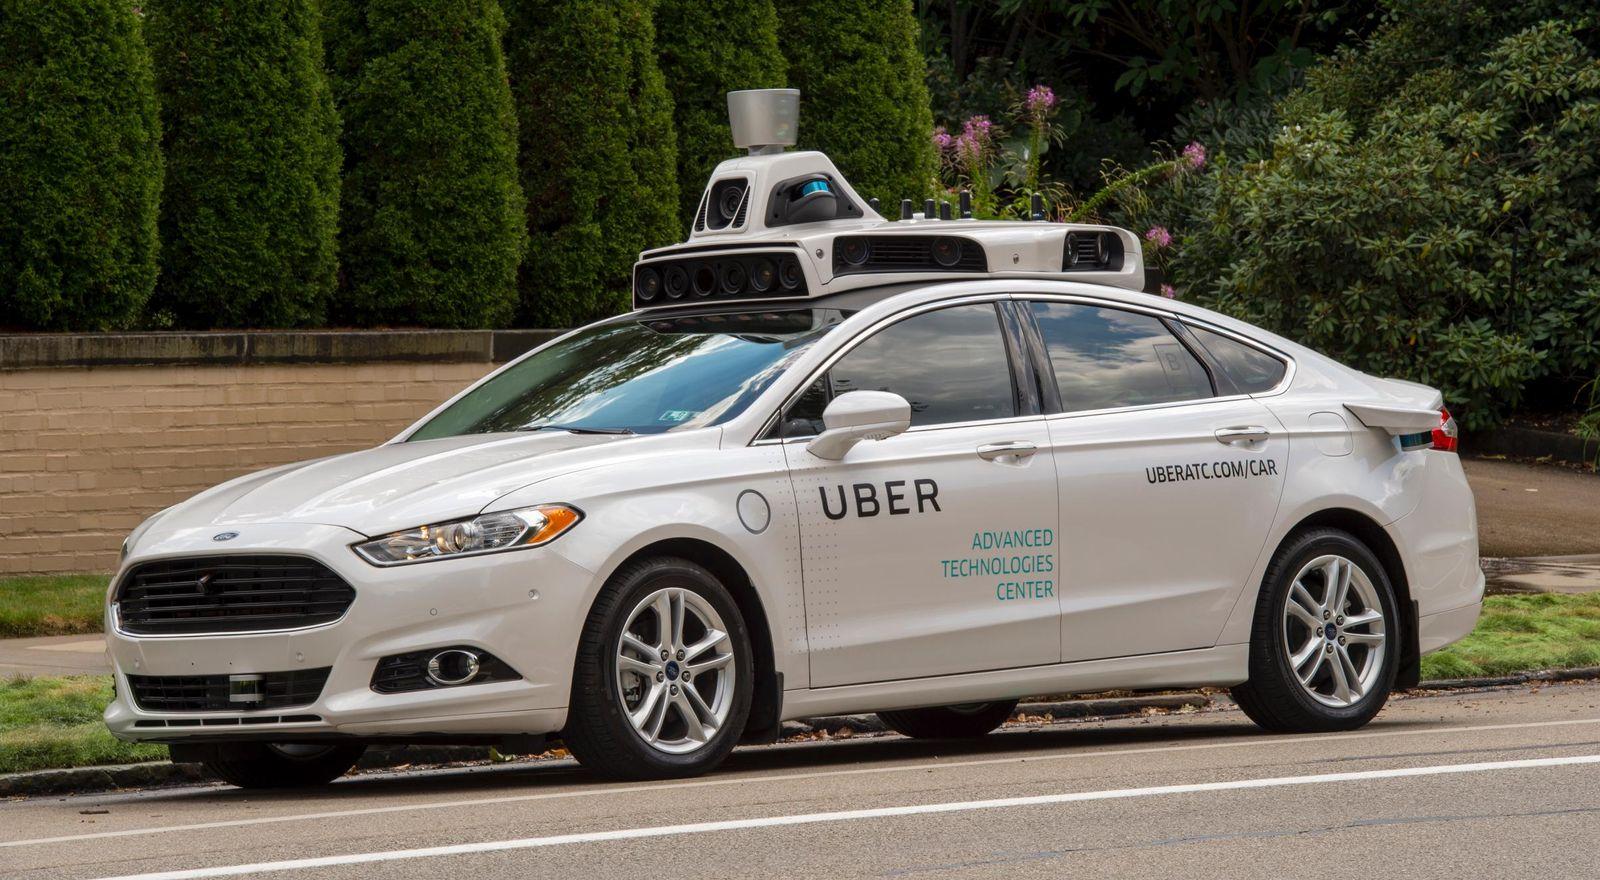 Uber / selbstfahrendes Auto